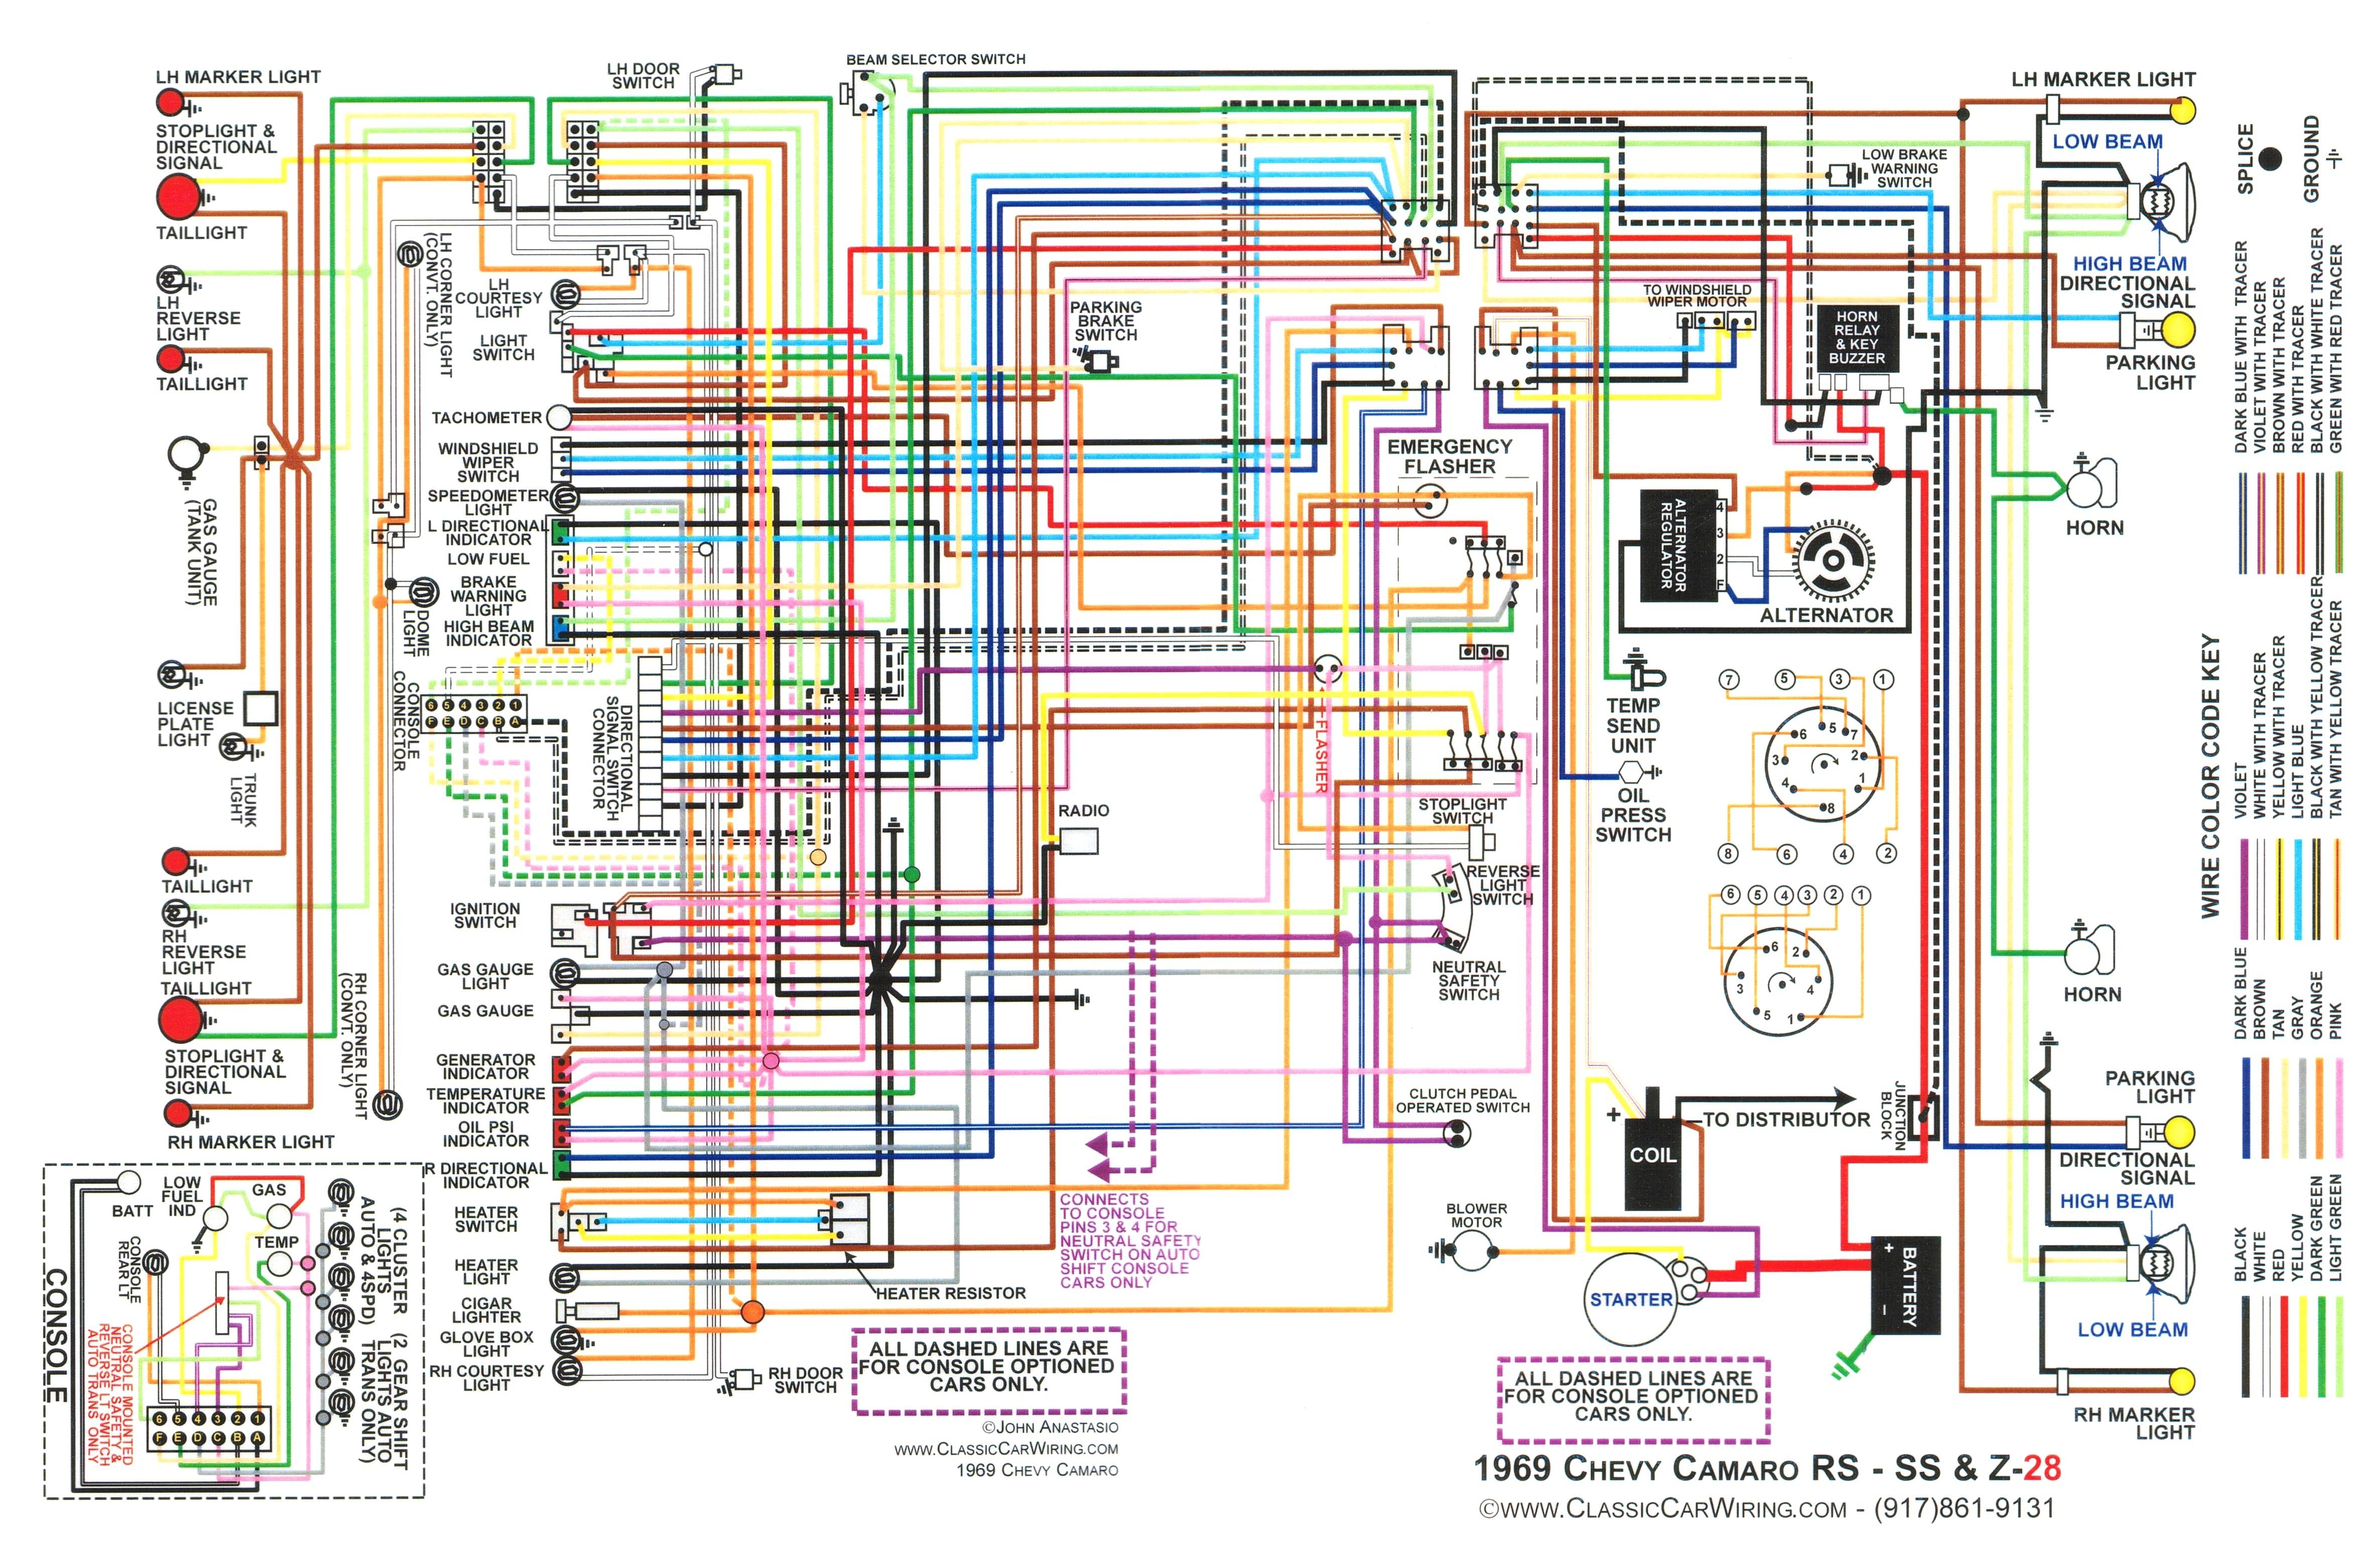 1968 Camaro Console Wiring Diagram | wiring diagram page evening | Spark Plug Nissan Ve30de Wiring Harness |  | Ferrini - Allestimenti